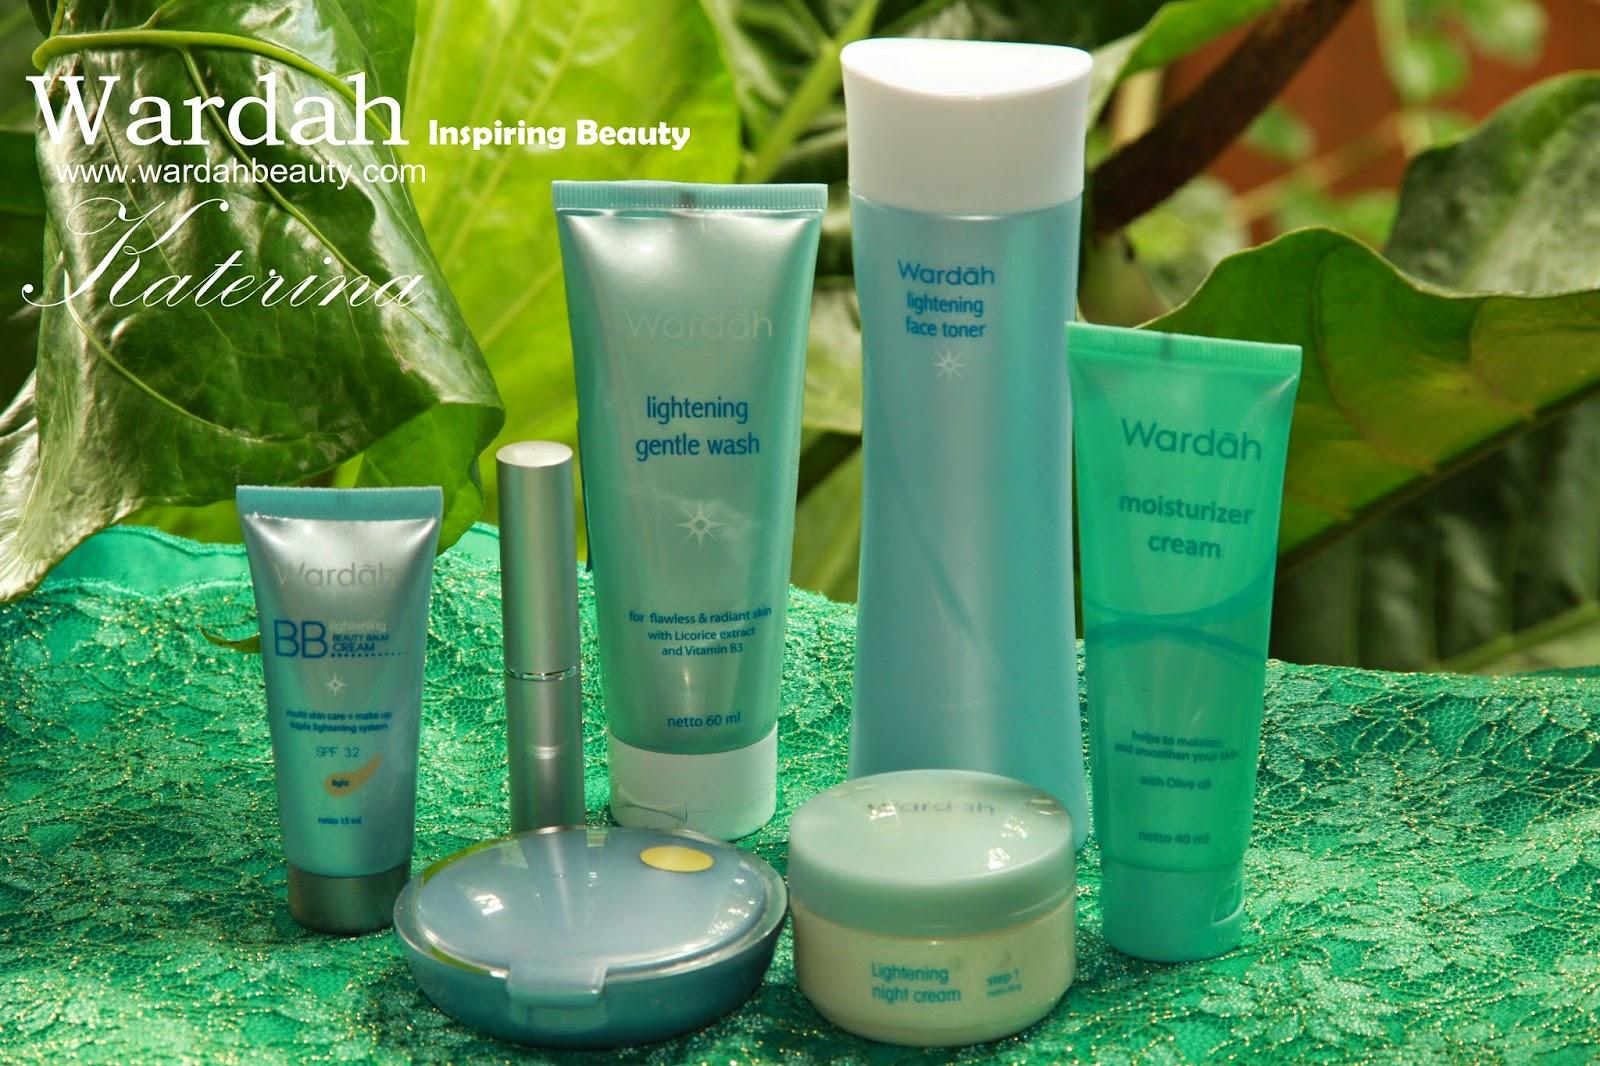 Memilih Kosmetika Halal Aman Dan Alami Katerina Wardah Lightening Grntle Wash Rangkaian Produk Untuk Penggunaan Sehari